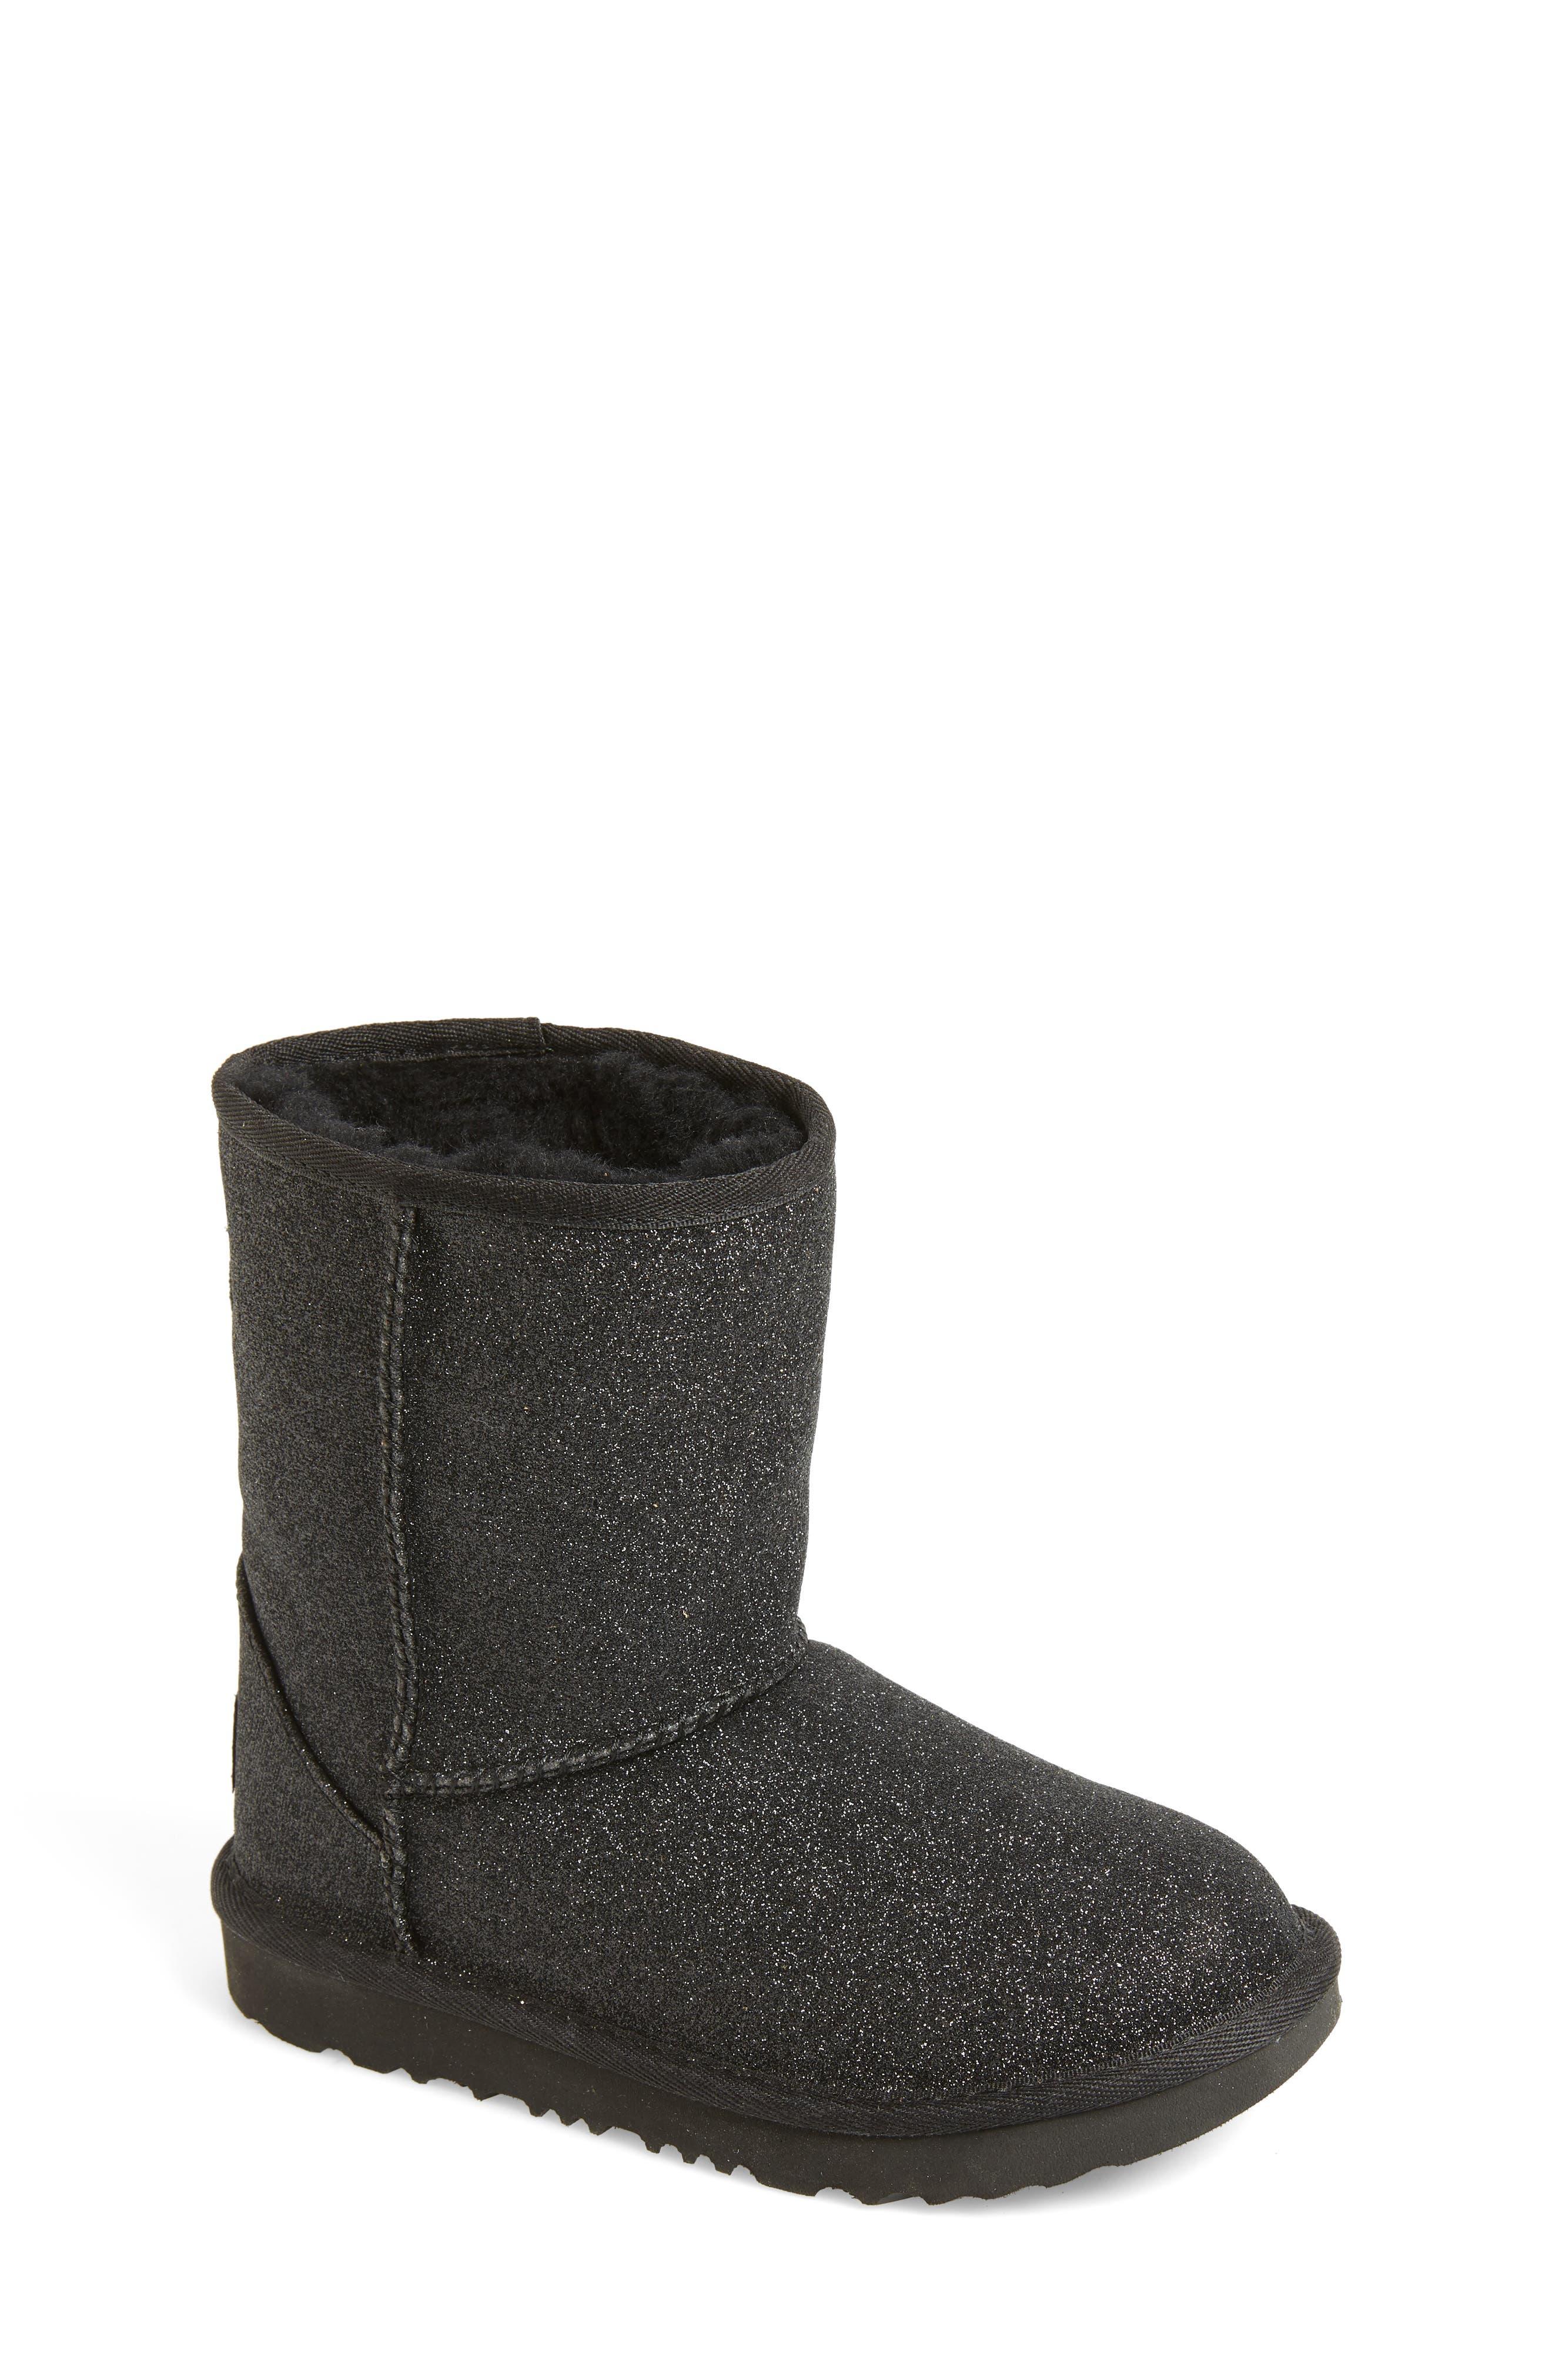 Girls' Shoes   Nordstrom Rack